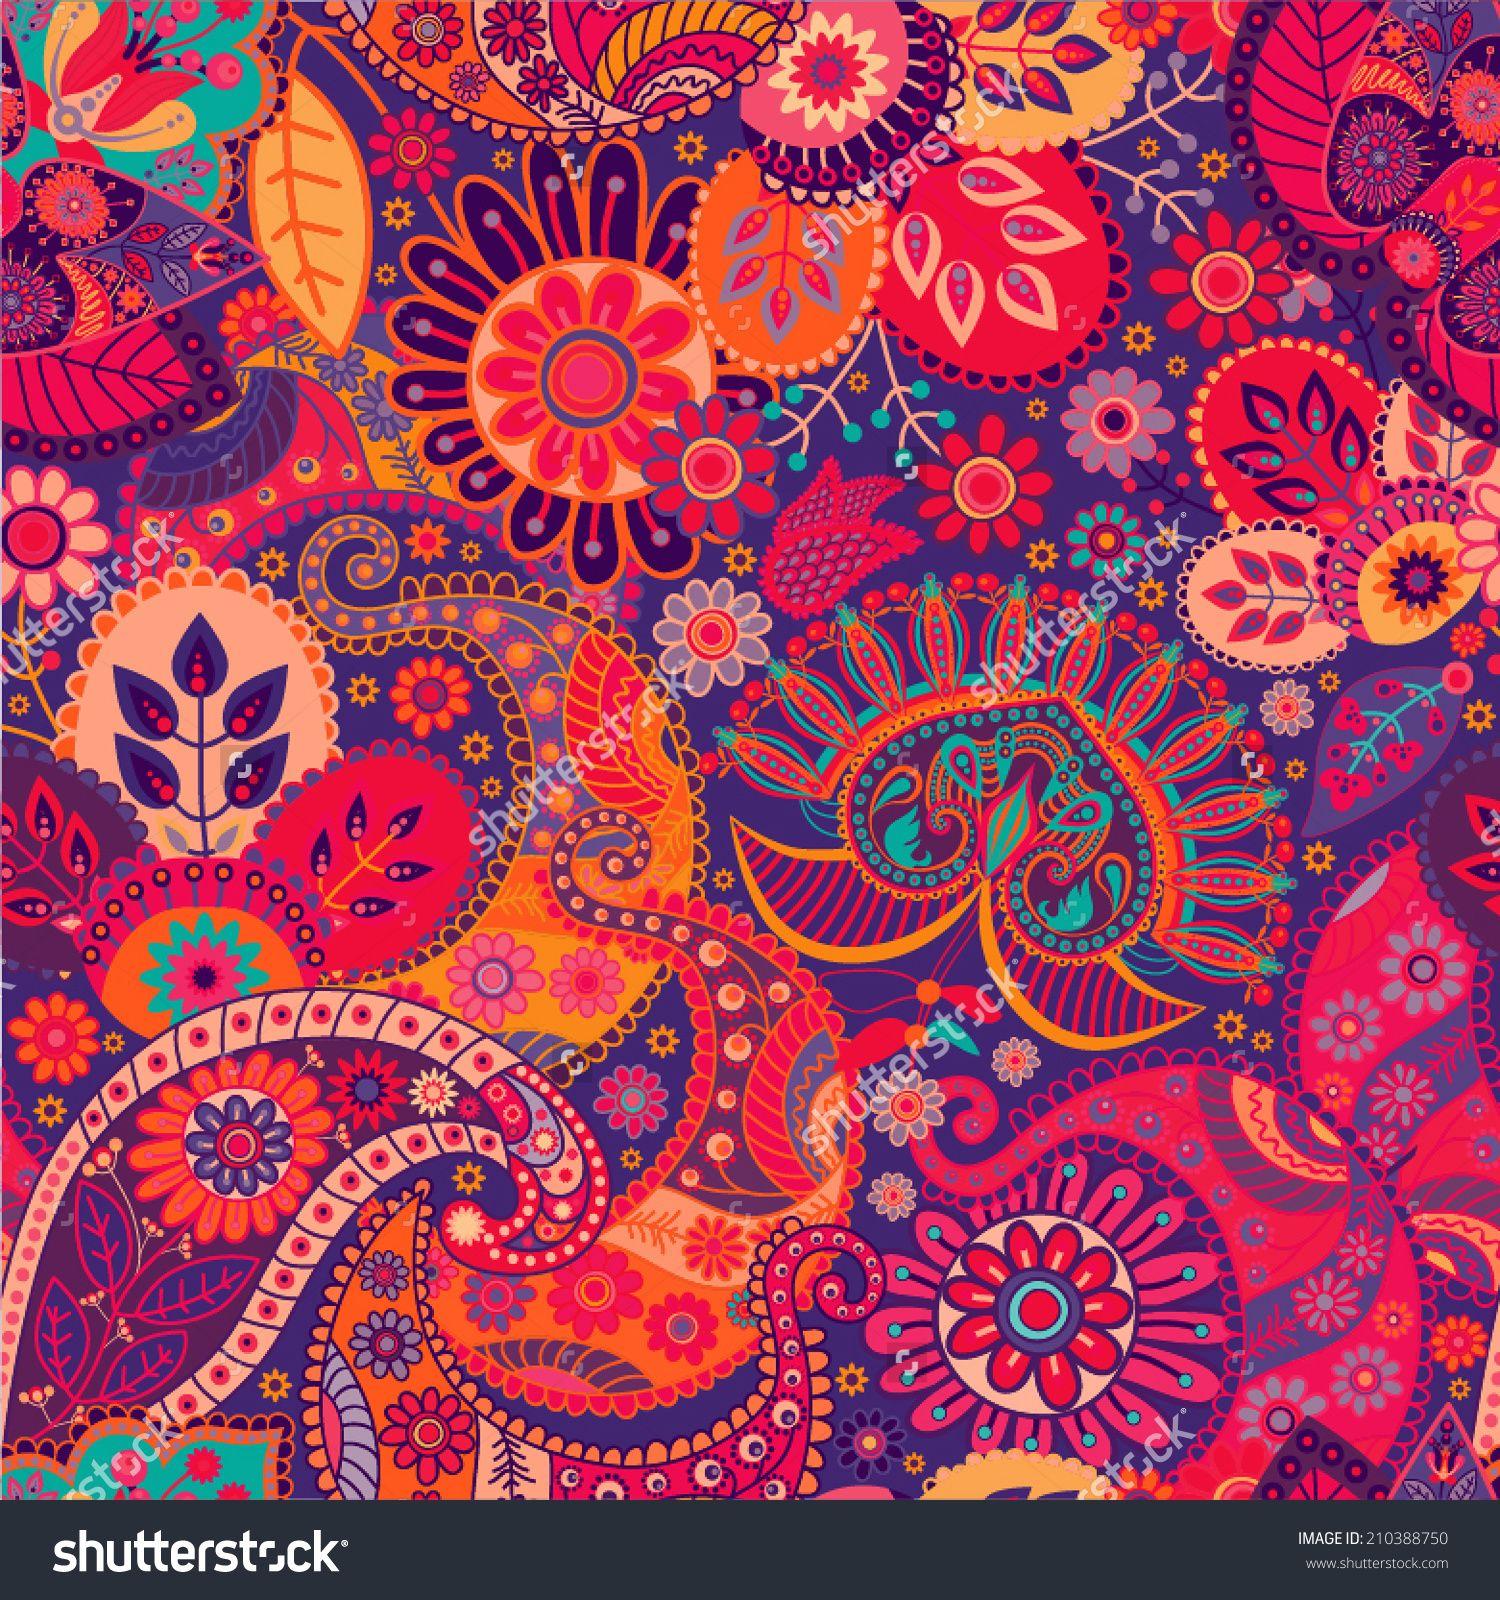 Paisley Wallpaper, Paisley